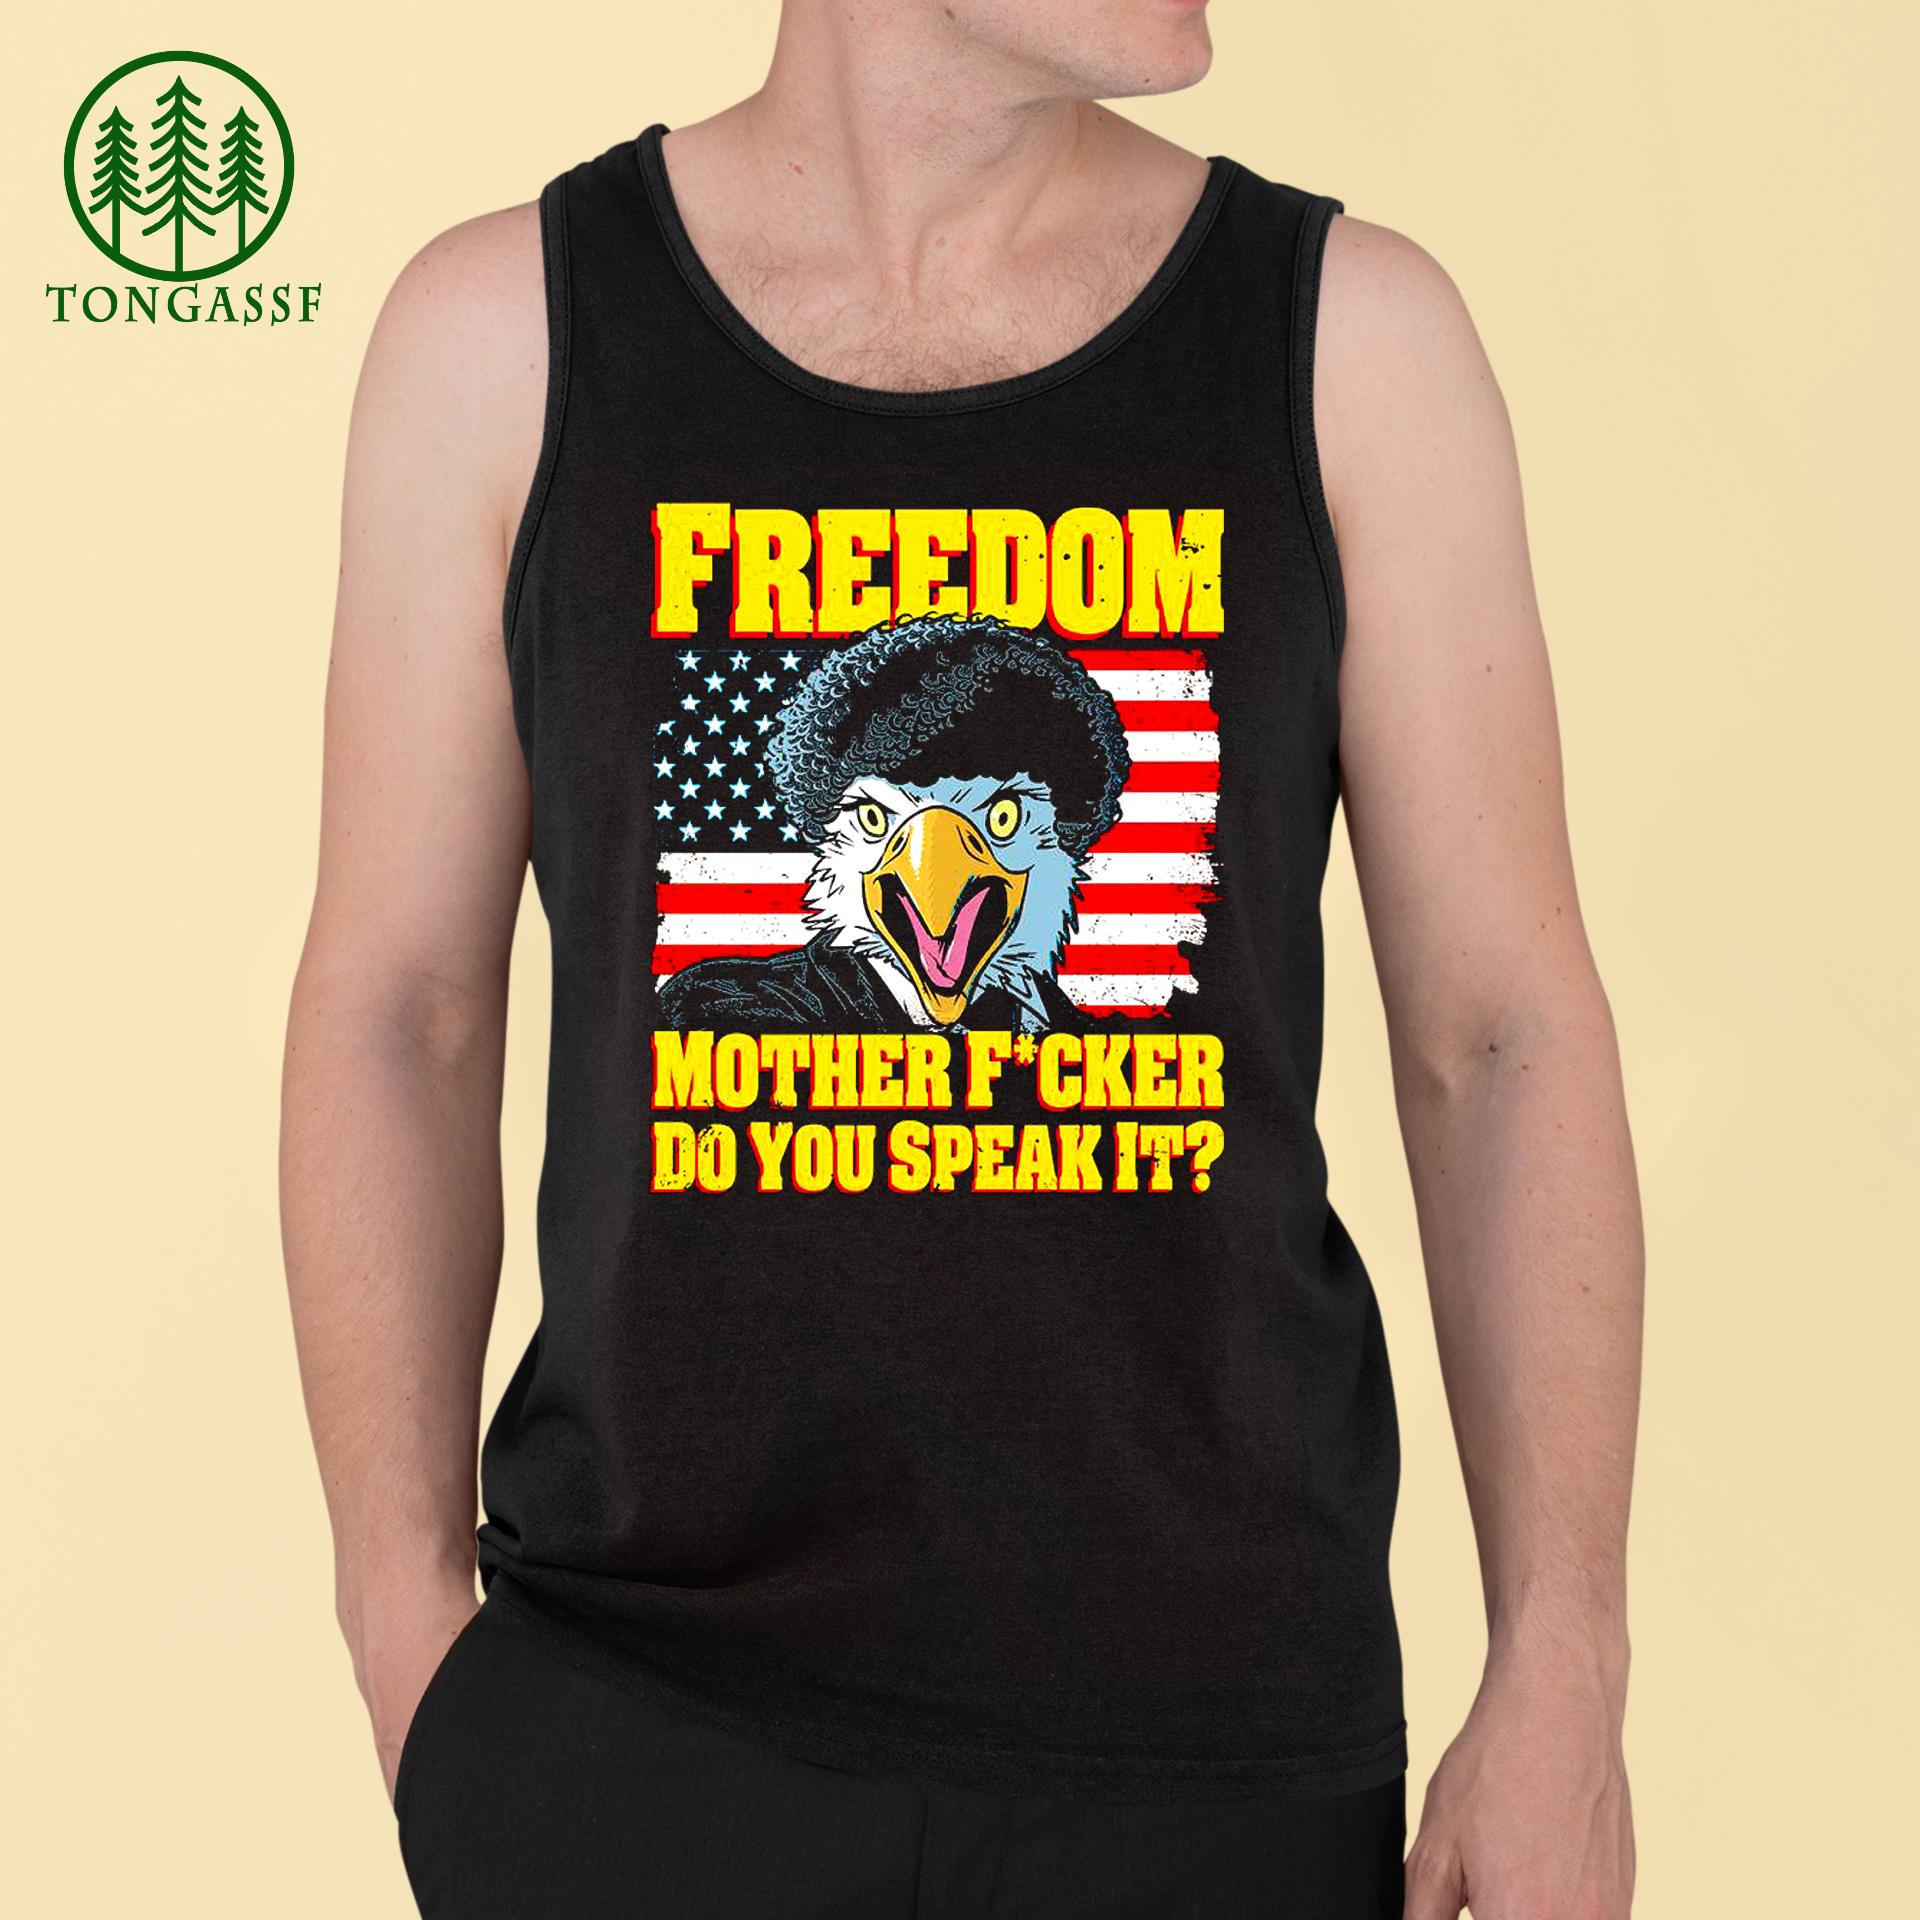 Freedom mother fucker do you speak it Shirt